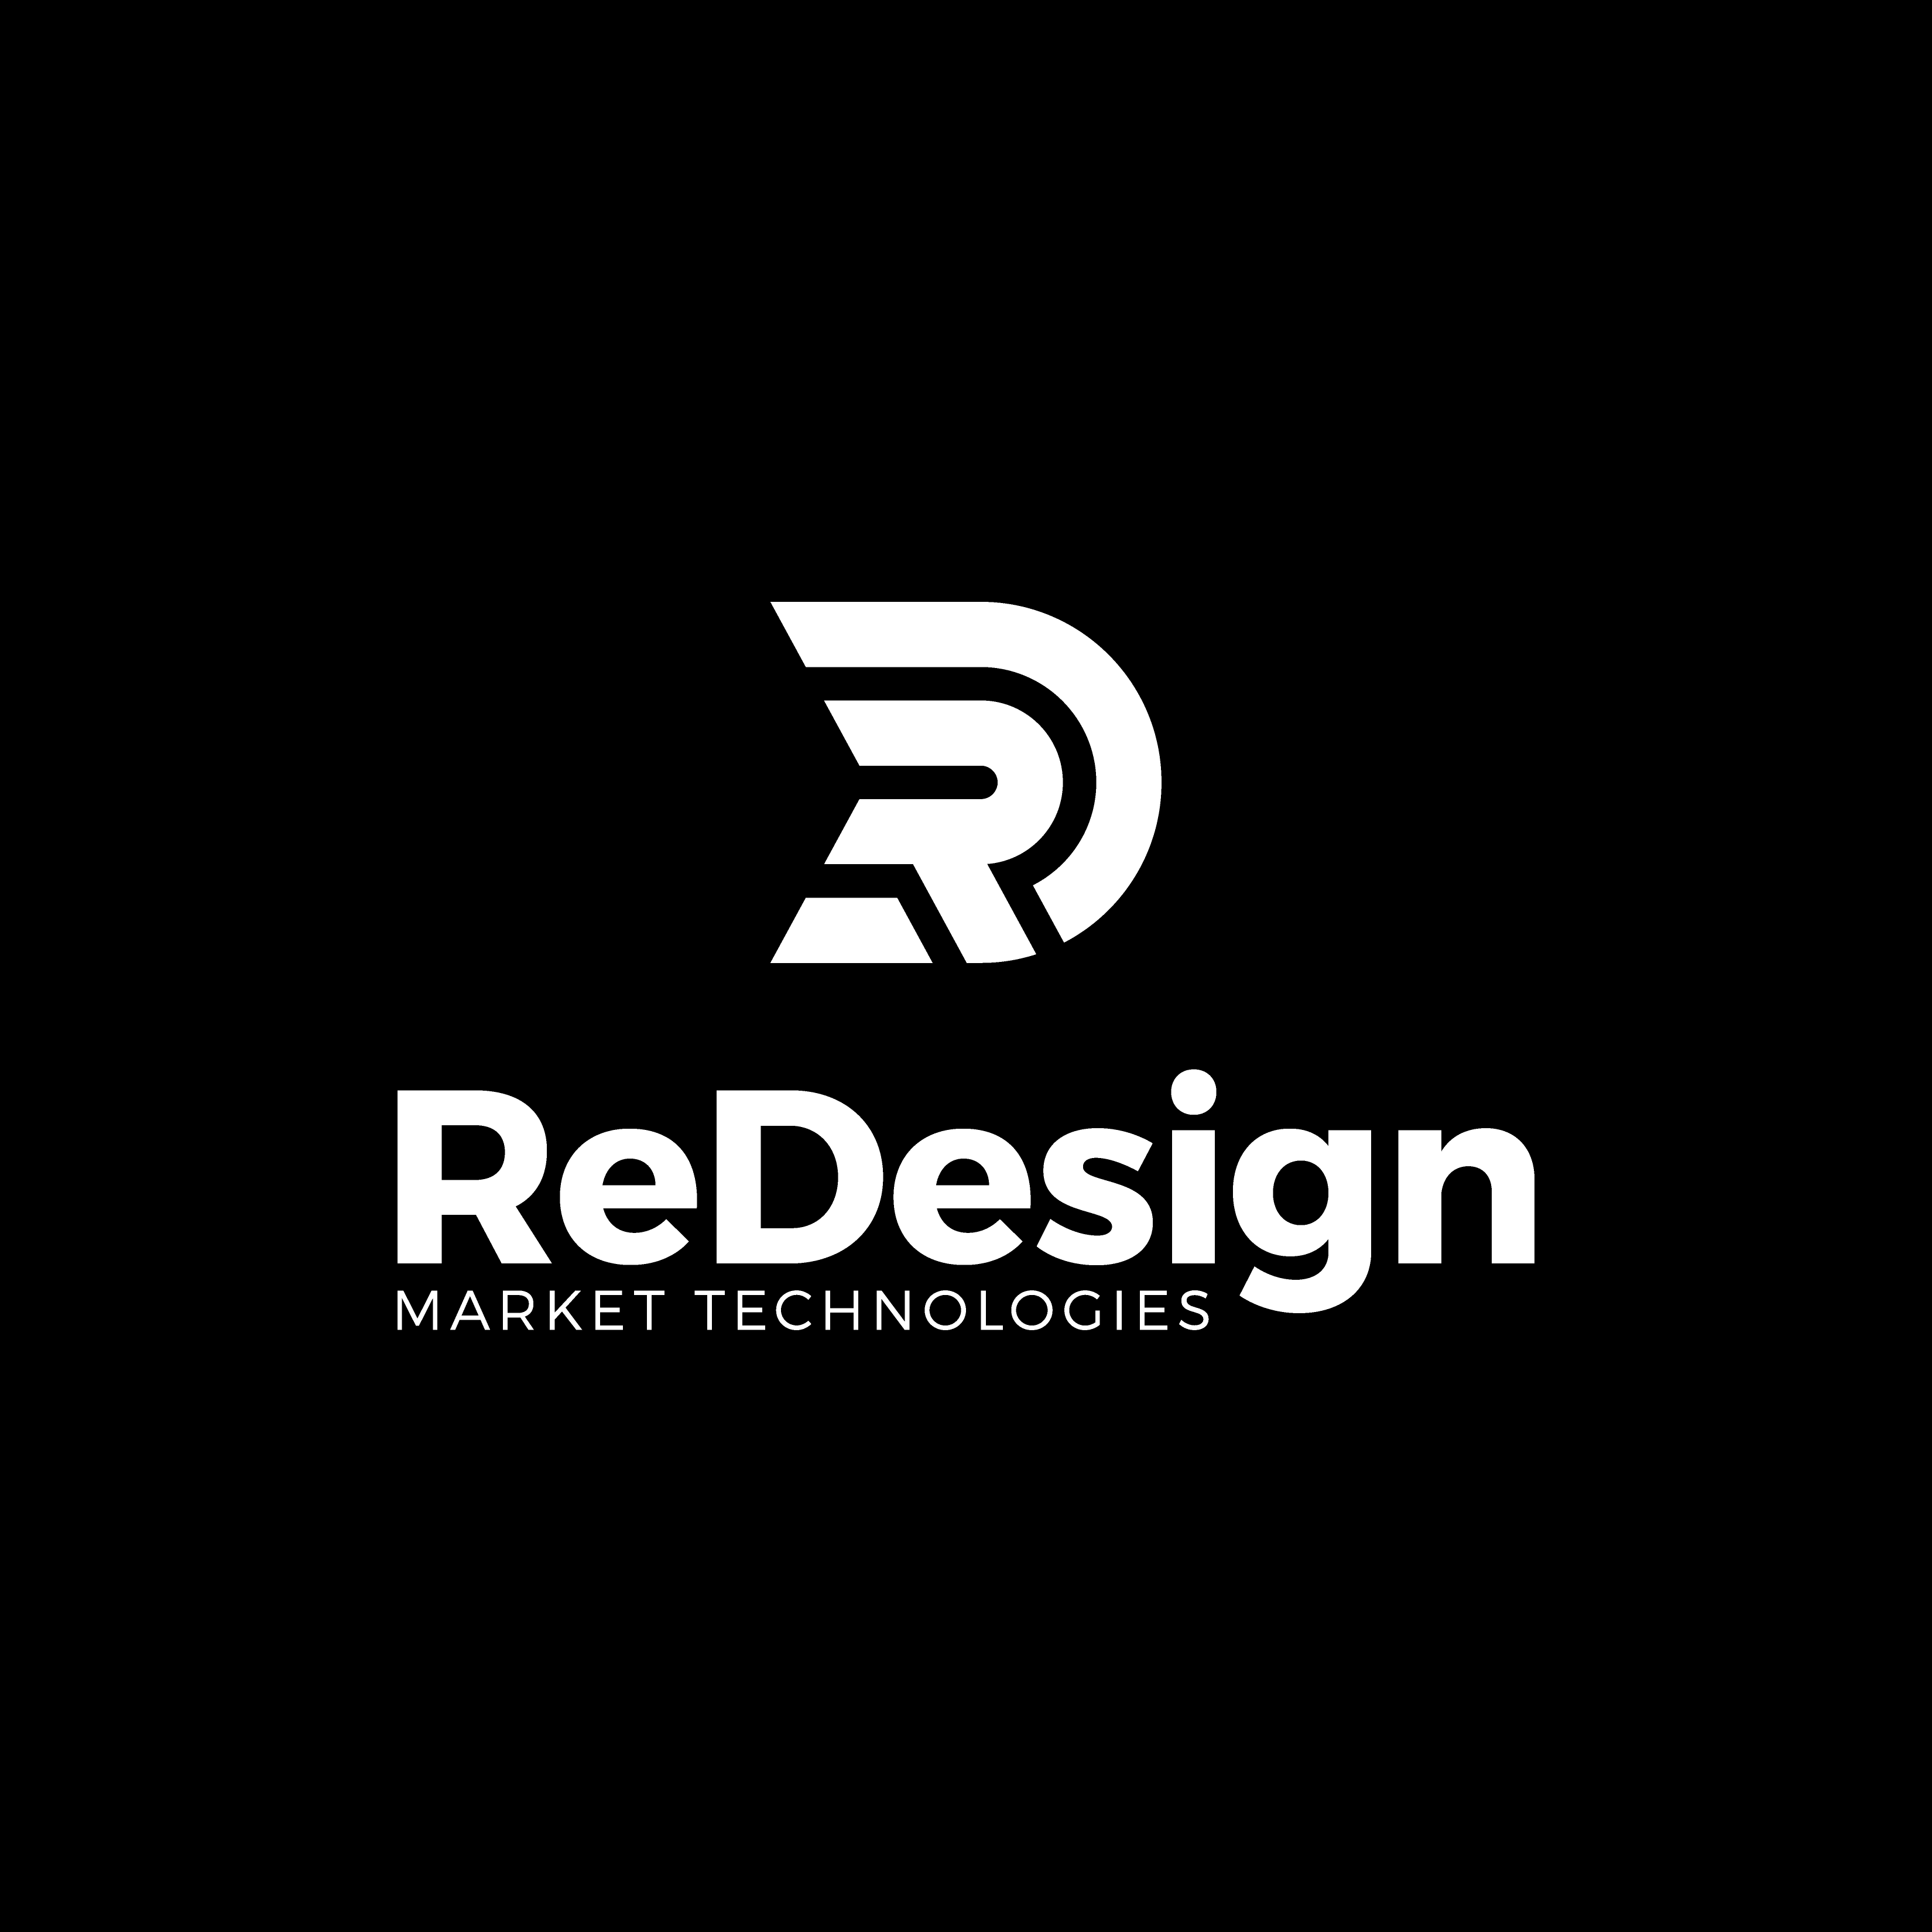 Design Creative Logo for Web / Mobile Development Company